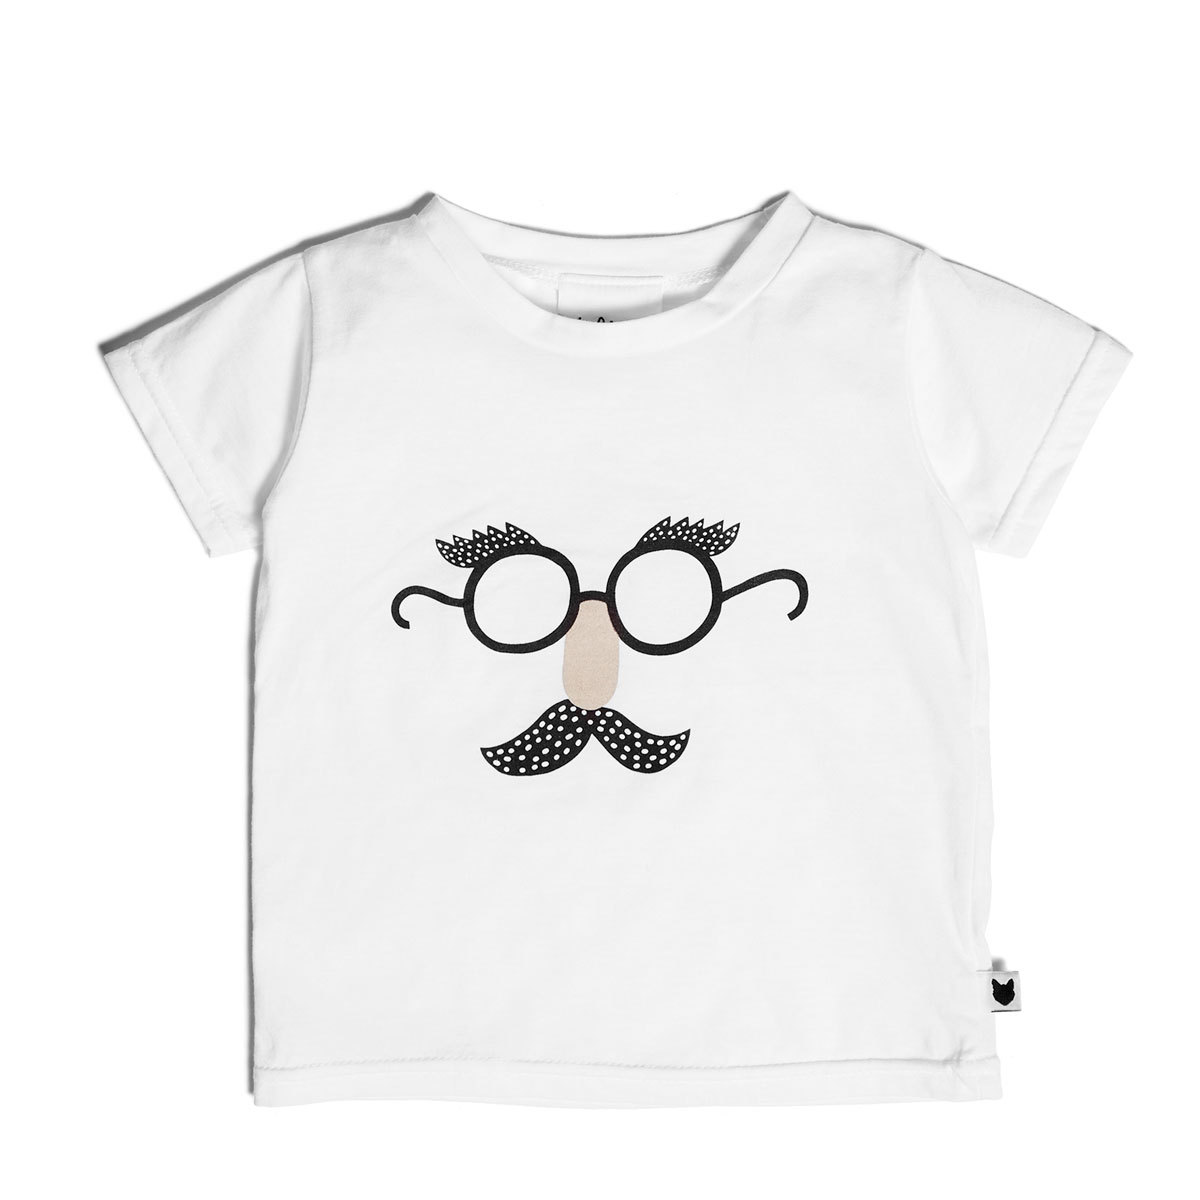 Hauts bébé Tee-Shirt Funny Face - 18/24 Mois Tee-Shirt Funny Face - 18/24 Mois